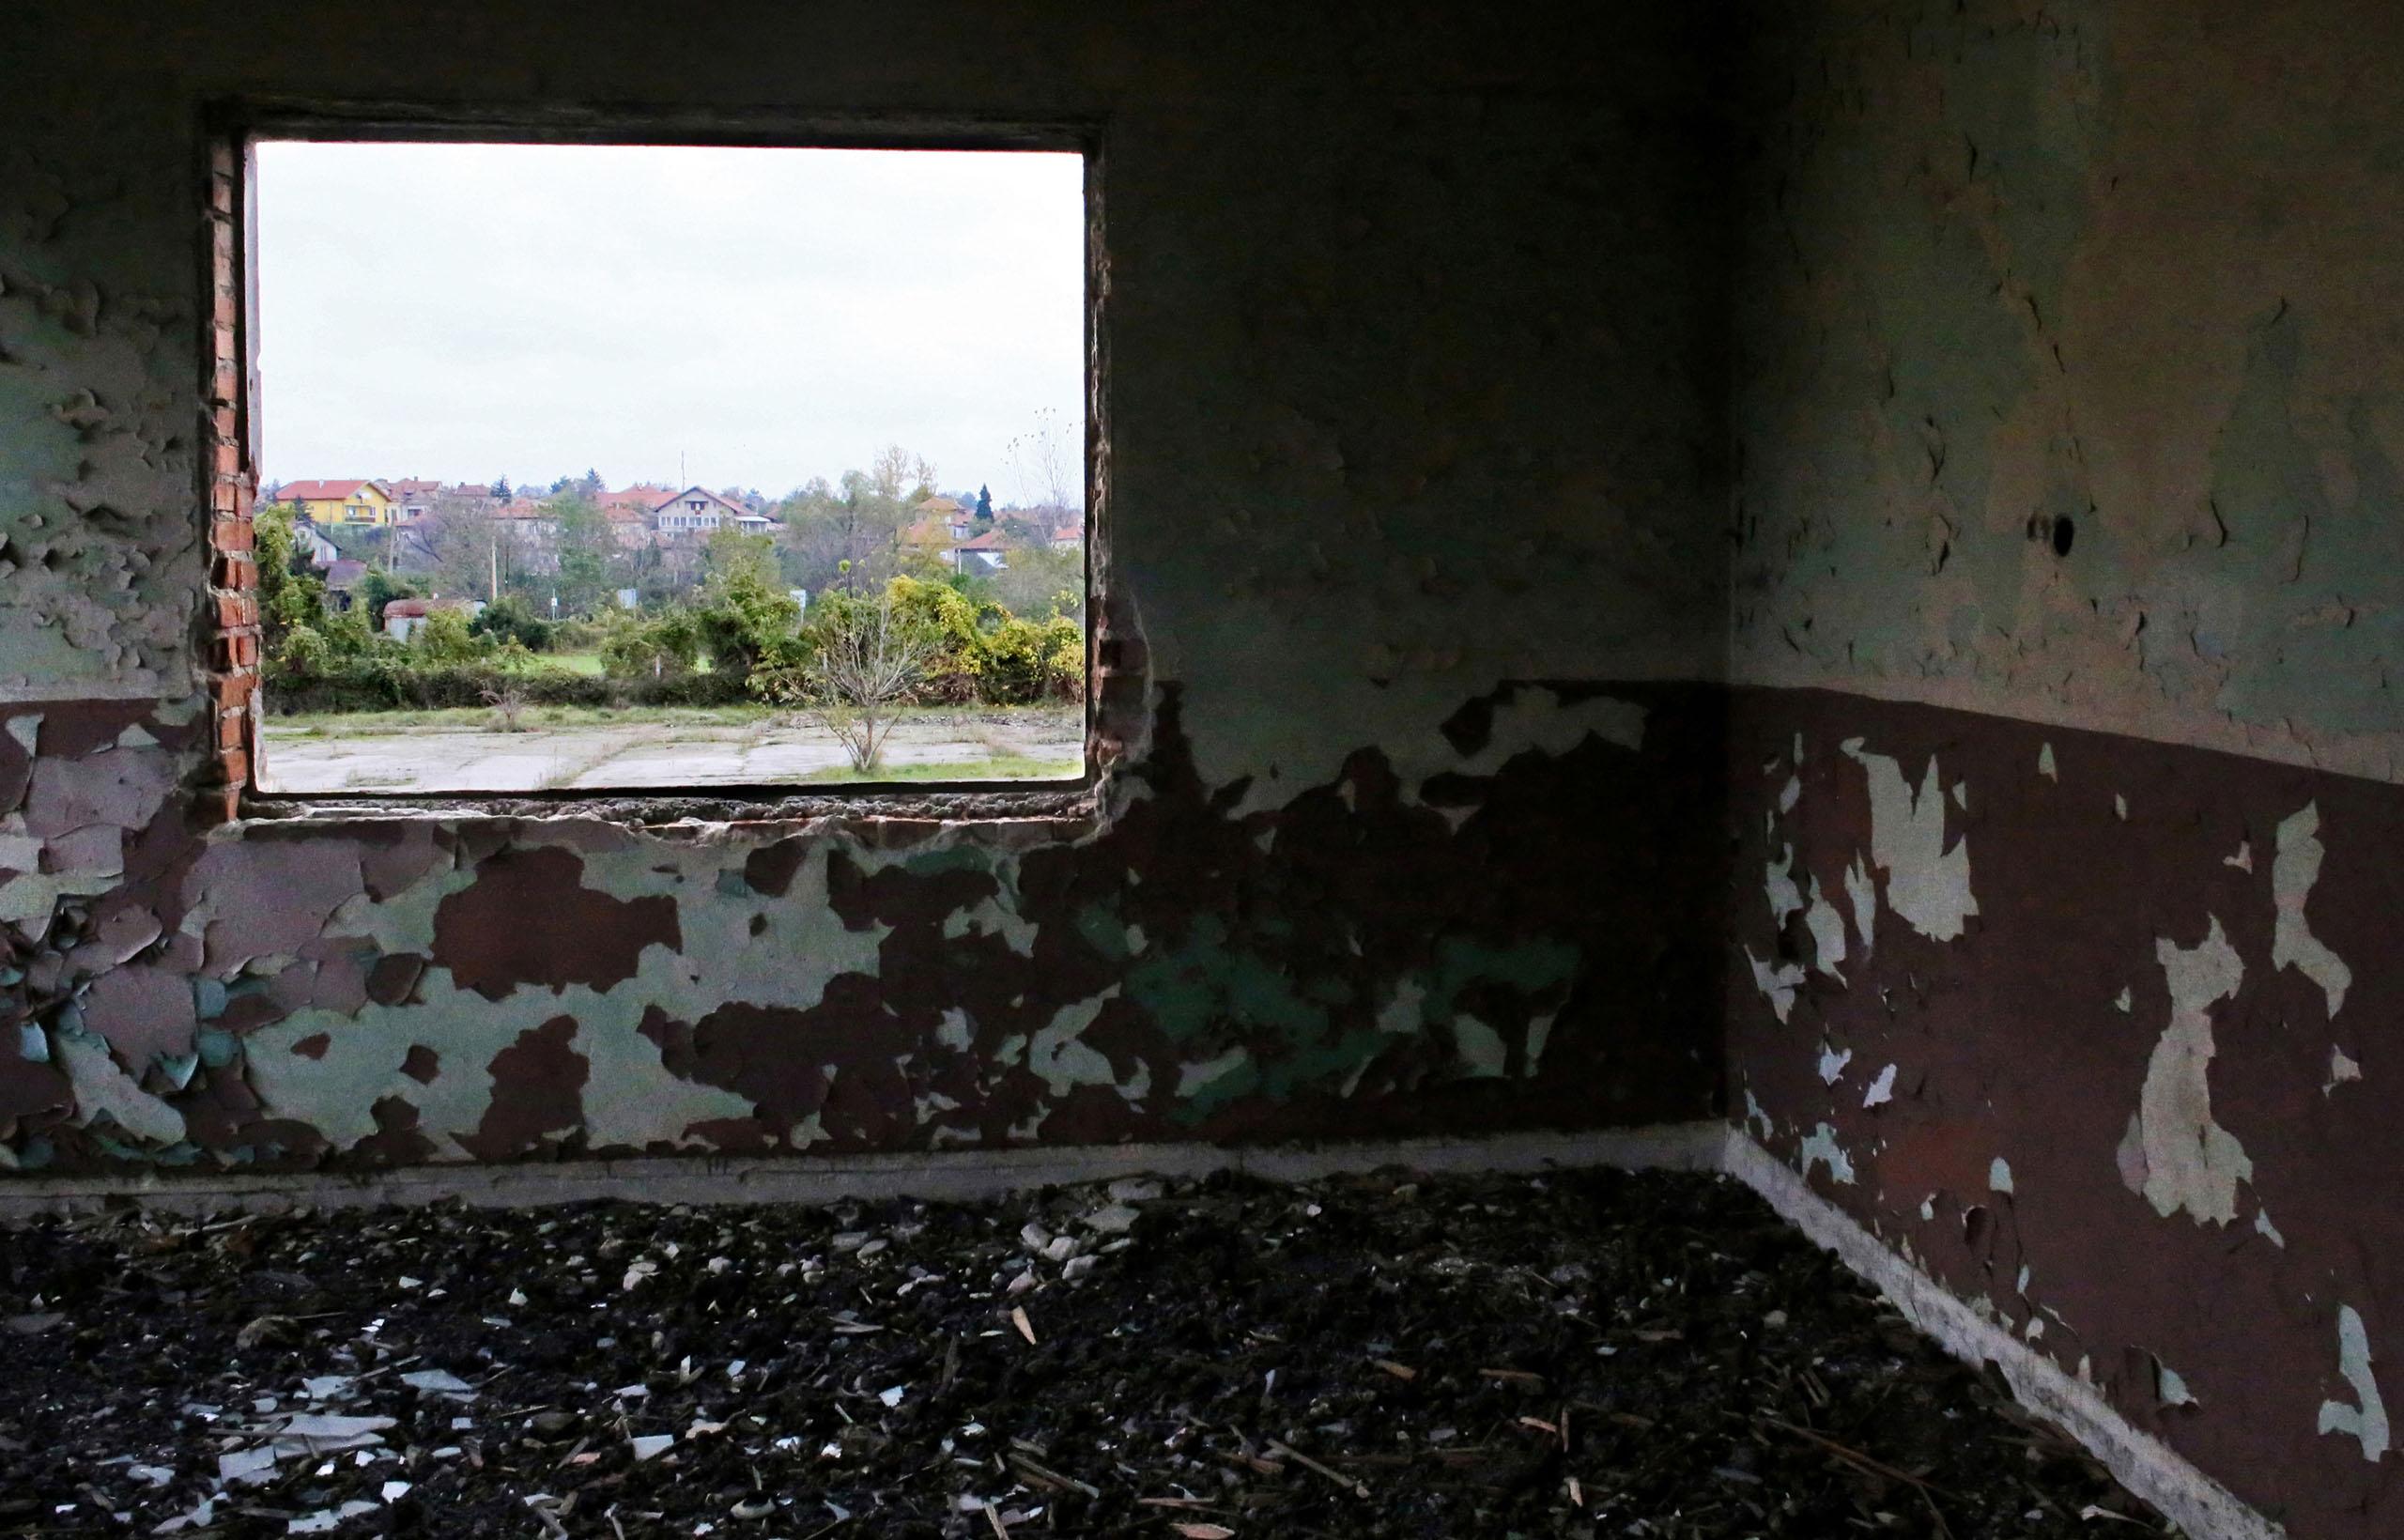 A window of an abandoned school in Dunavtsi, Bulgaria, Oct. 27, 2014.